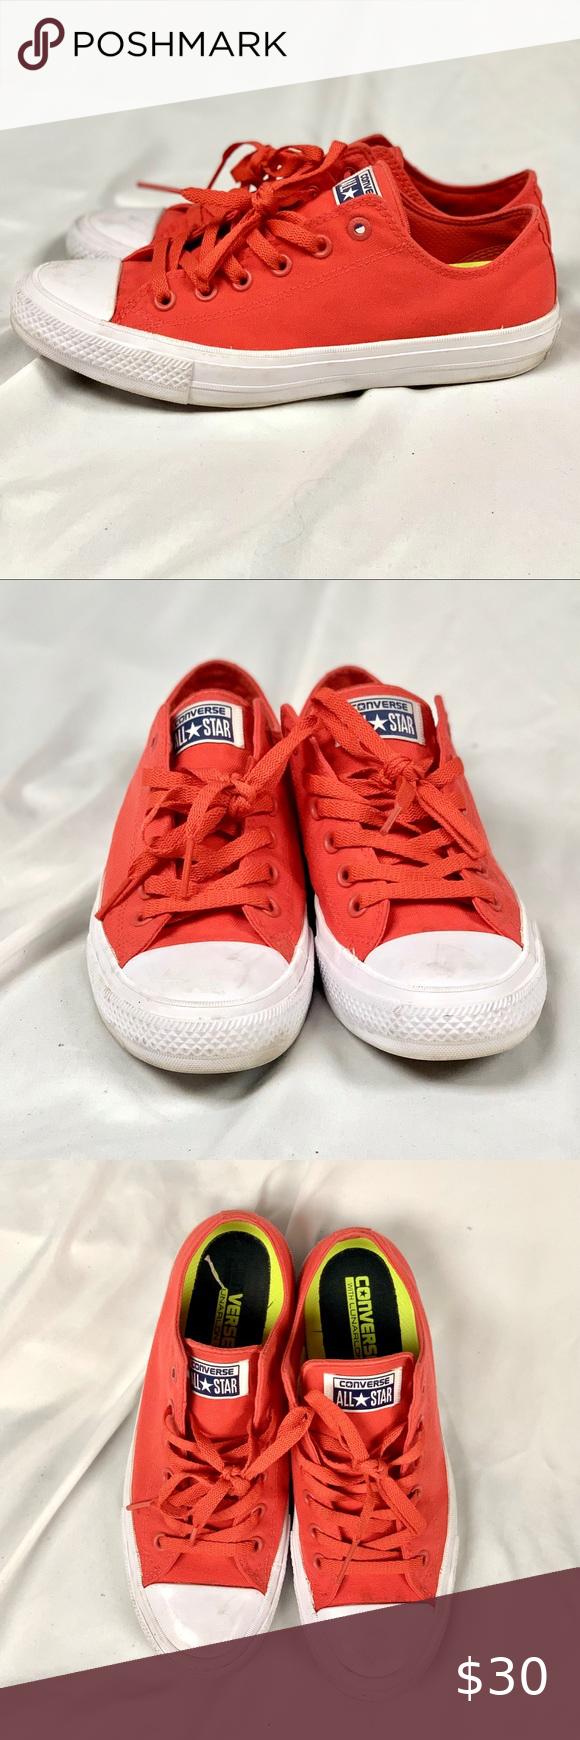 Porra doble Arado  Converse All-Star, Nike Lunarlon insole, worn once   Converse all star,  Worn, Converse